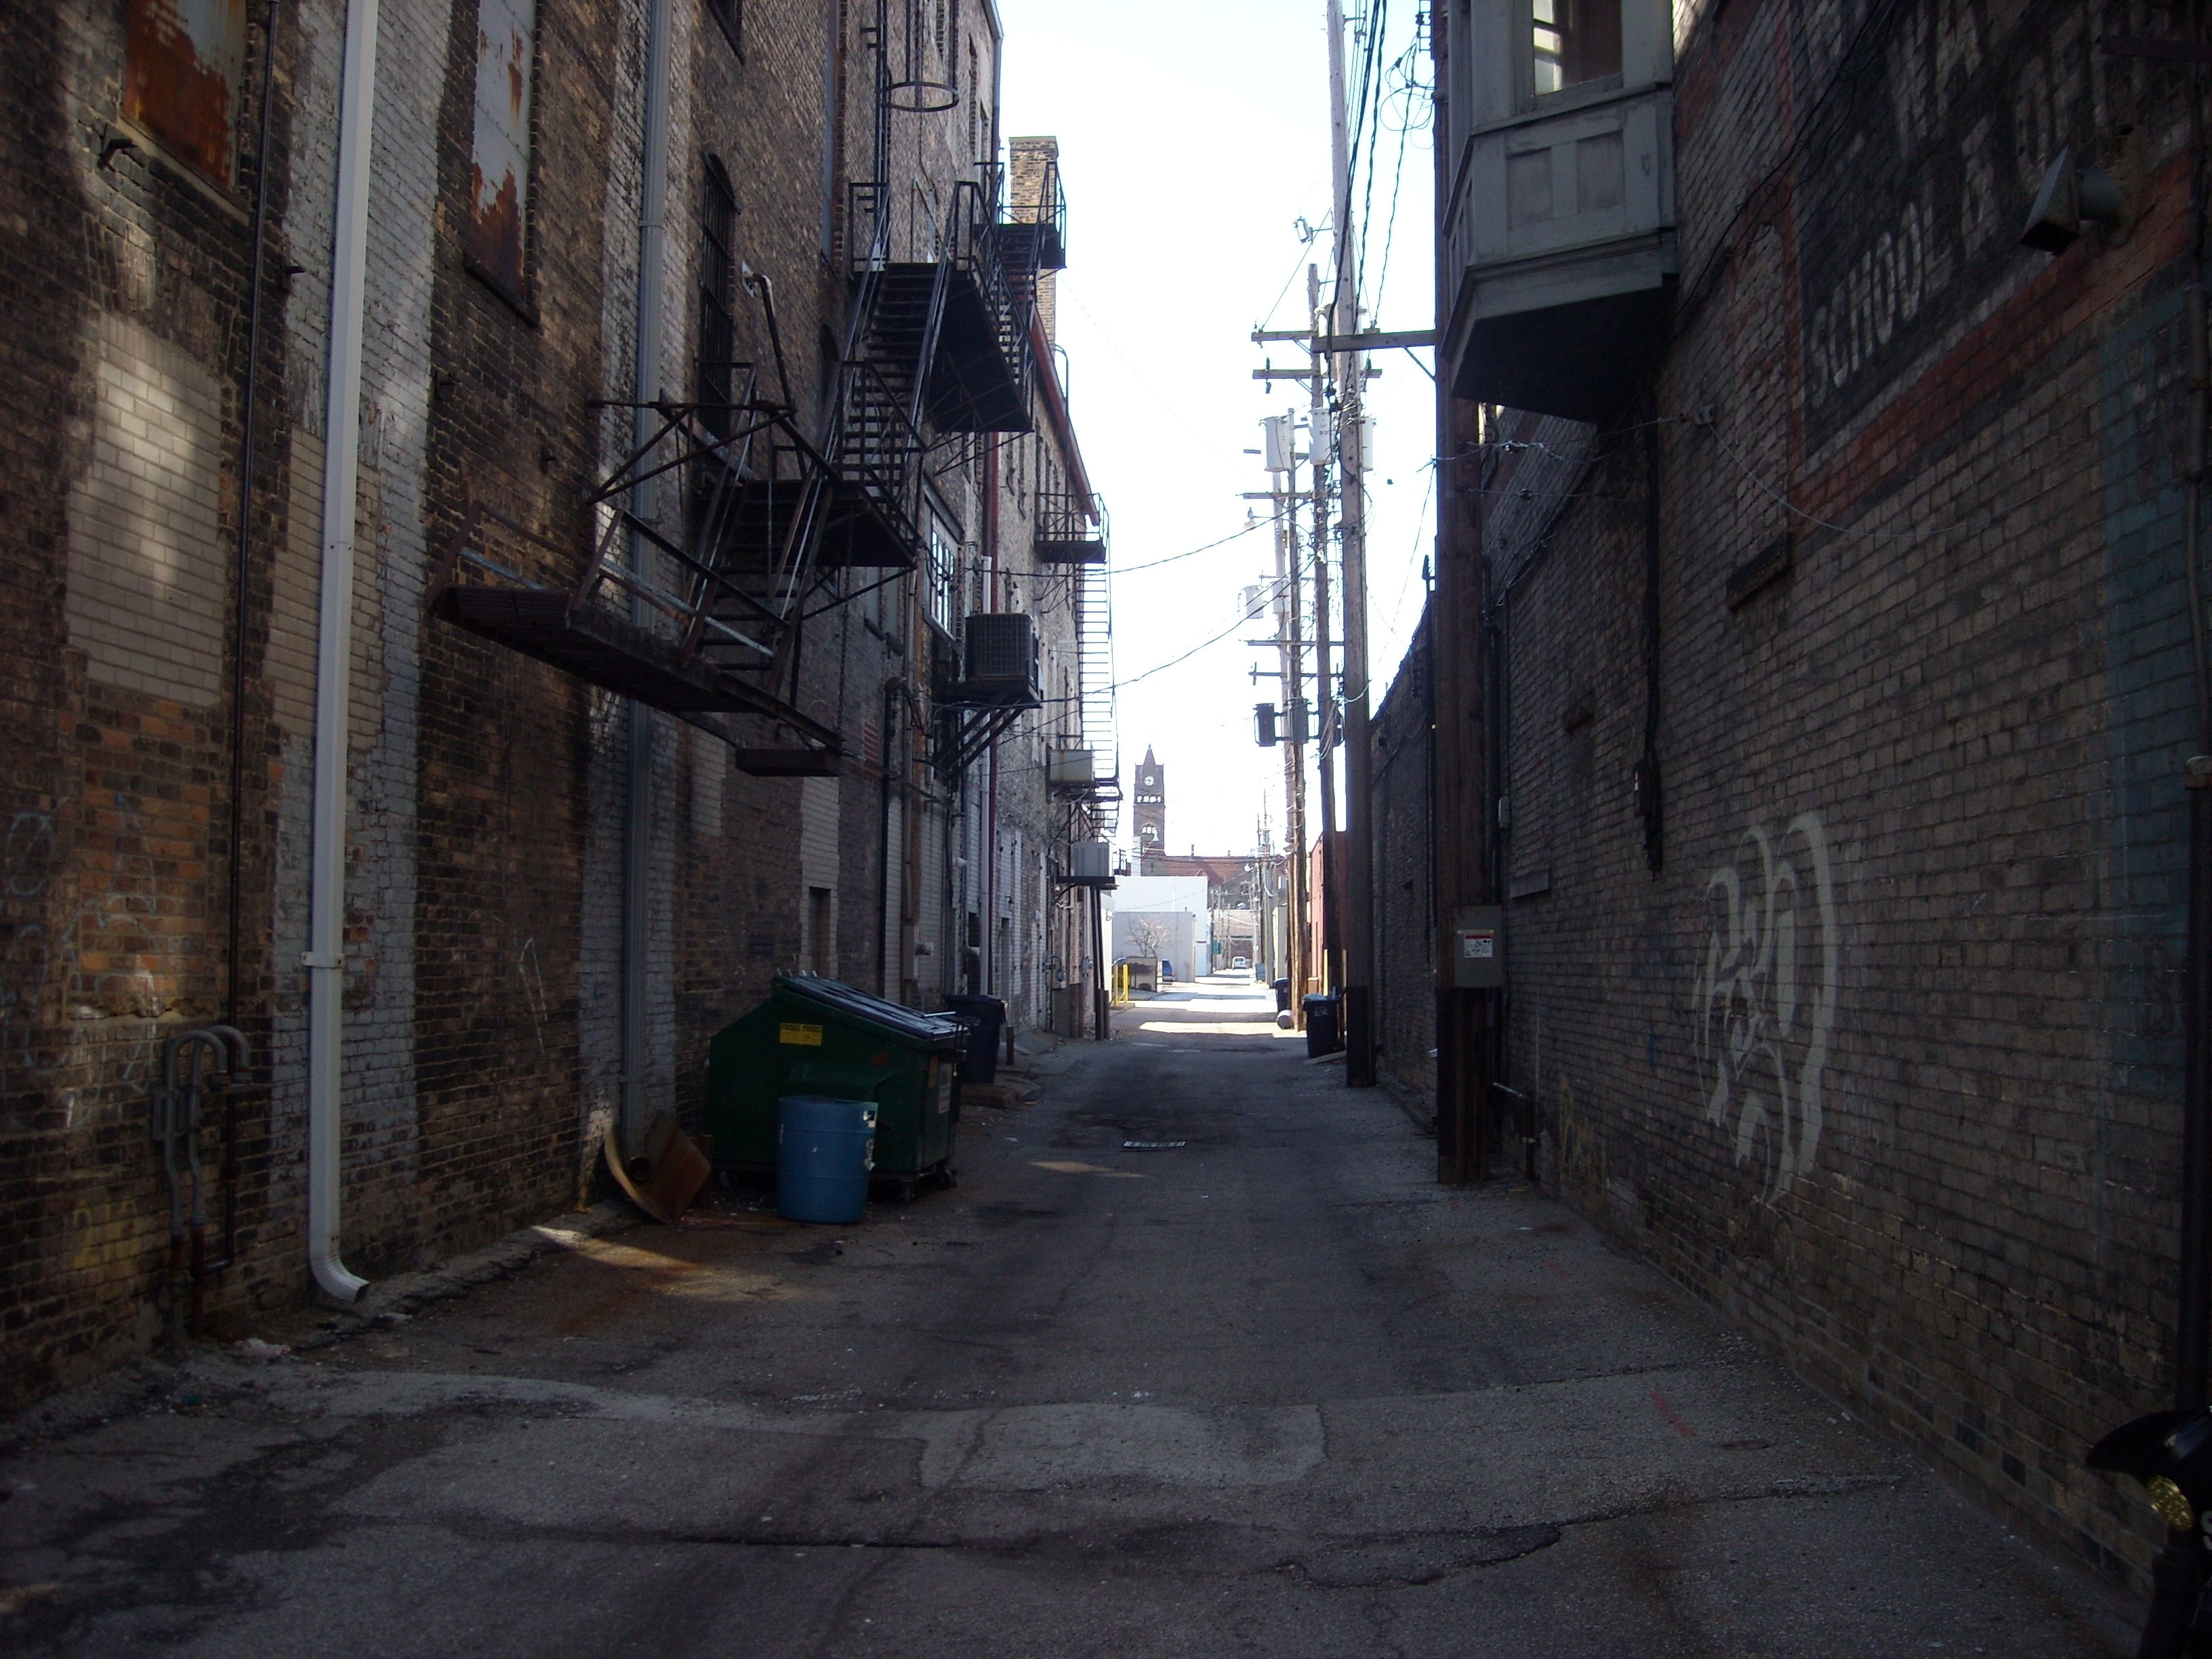 Alleyway Wallpaper Dark Alleyway Endroits A Visiter